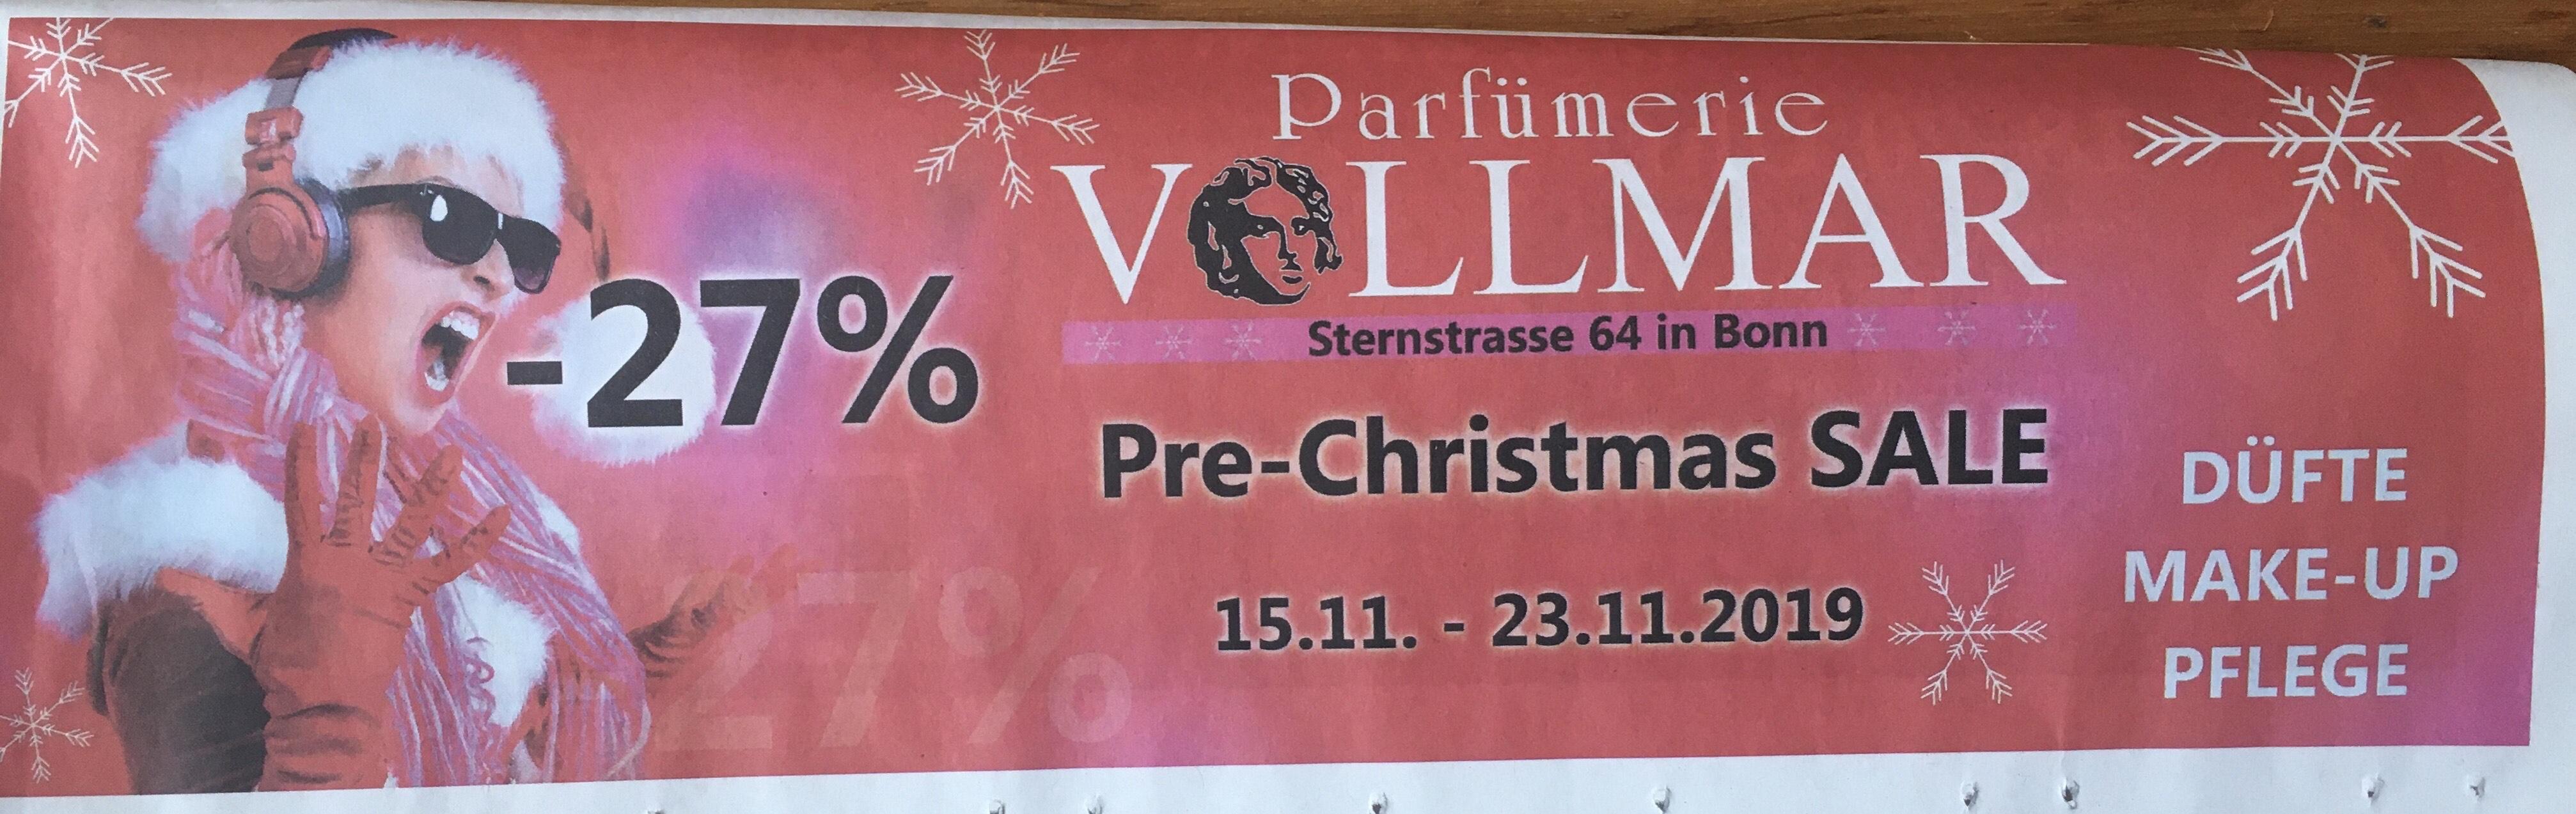 Vollmar Parfümerie -27% Lokal Bonn